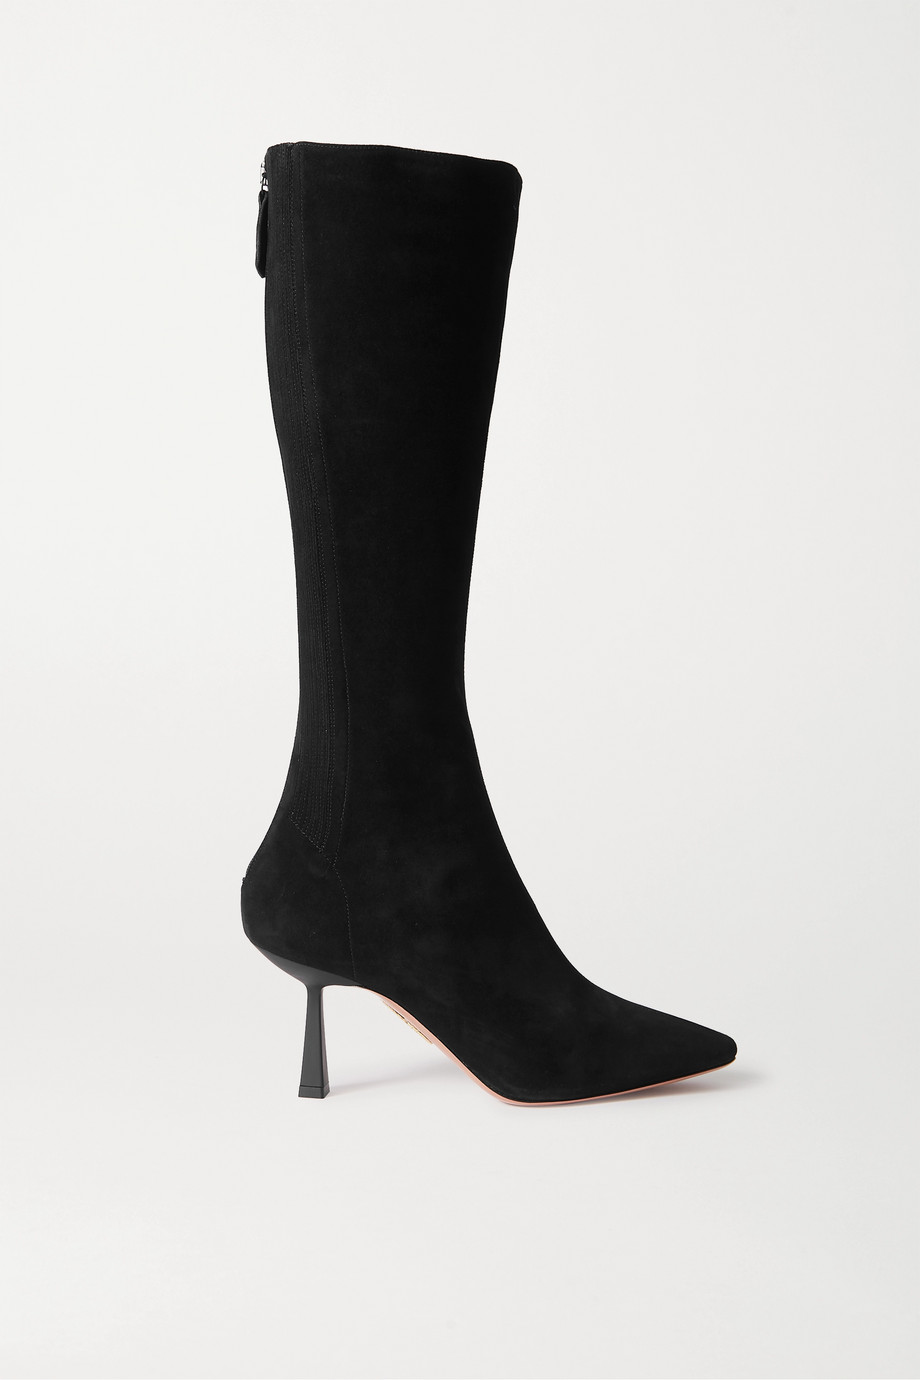 Aquazzura Curzon 75 suede knee boots